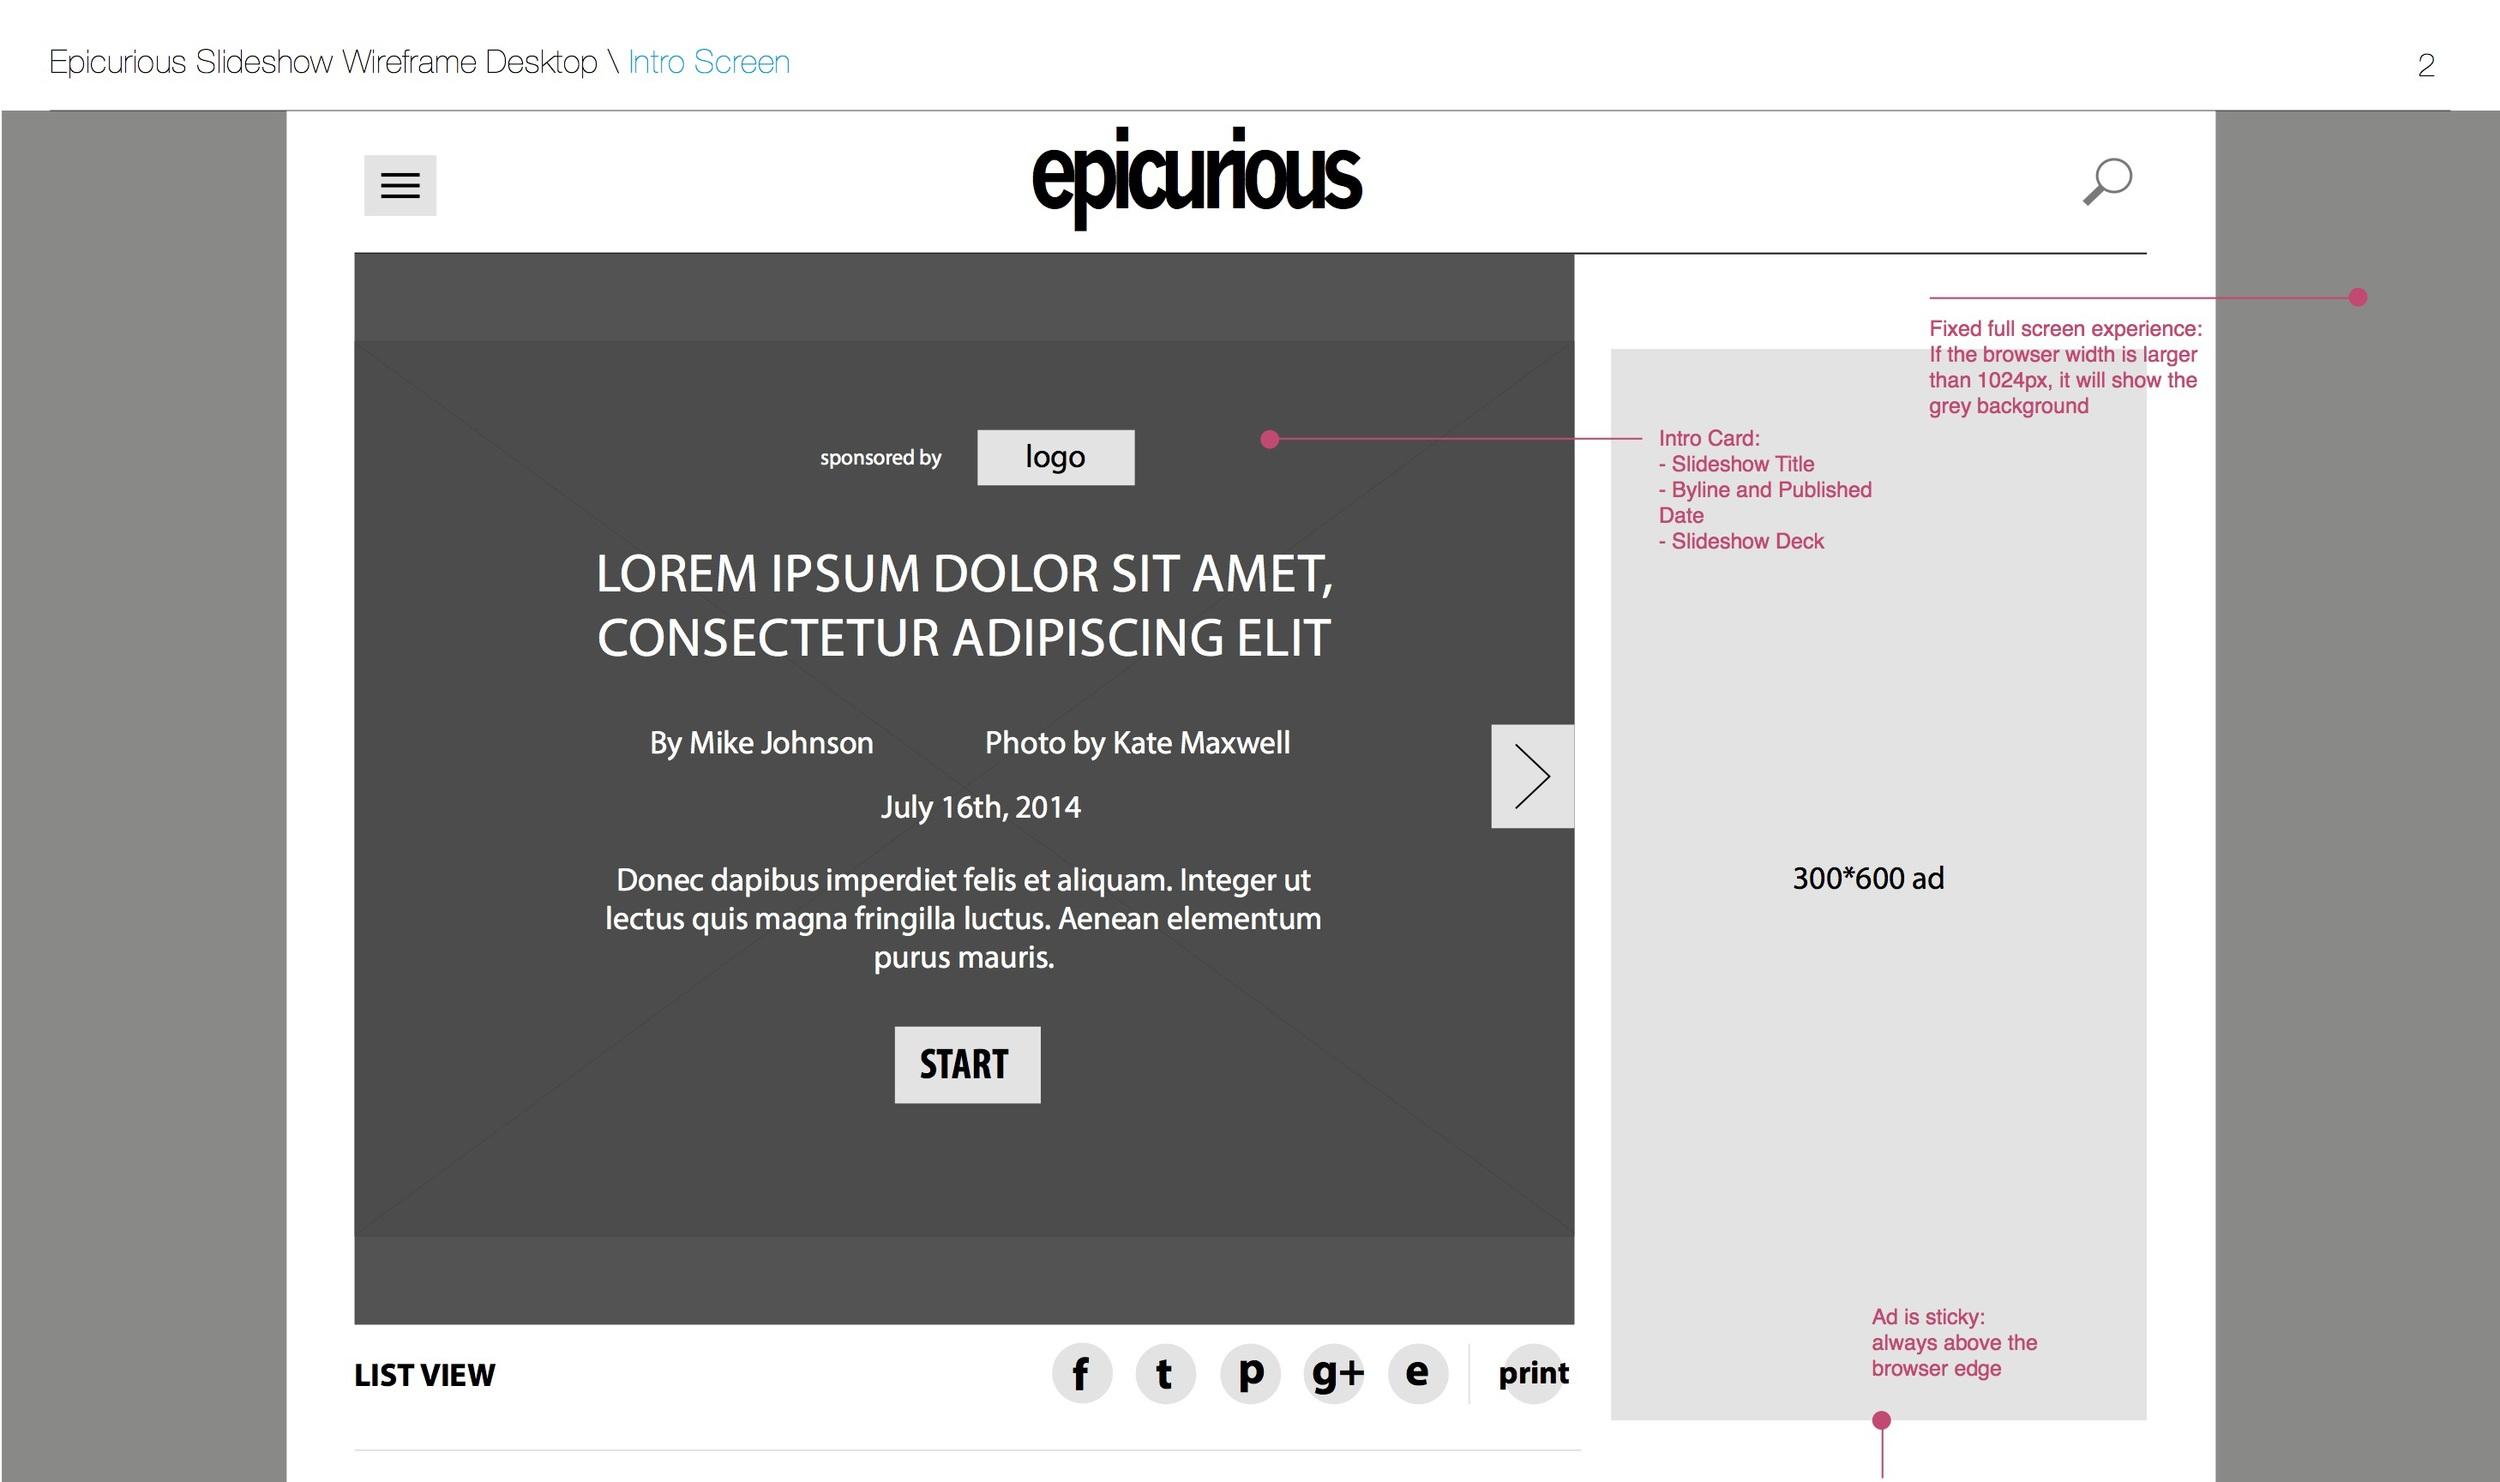 Epi_Slideshow_Wires_V4_1.jpg